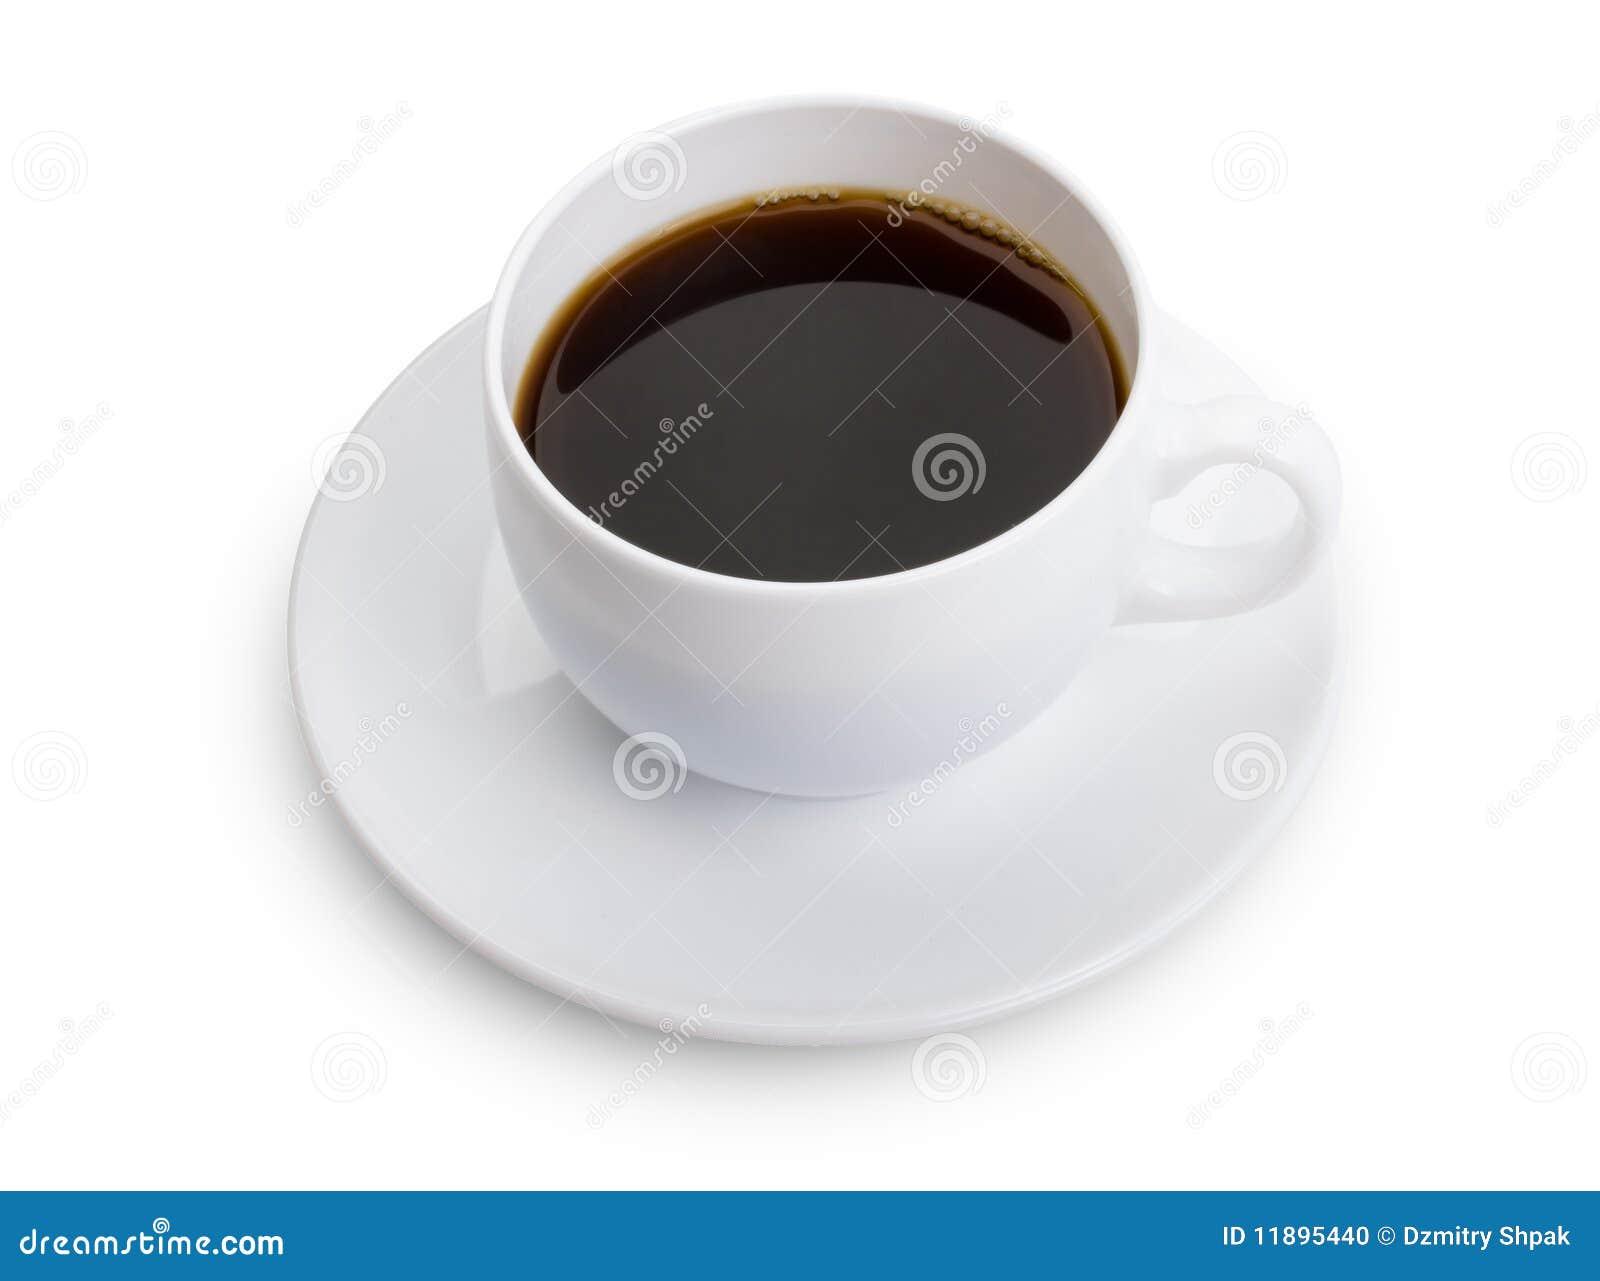 Kop met koffie op witte achtergrond